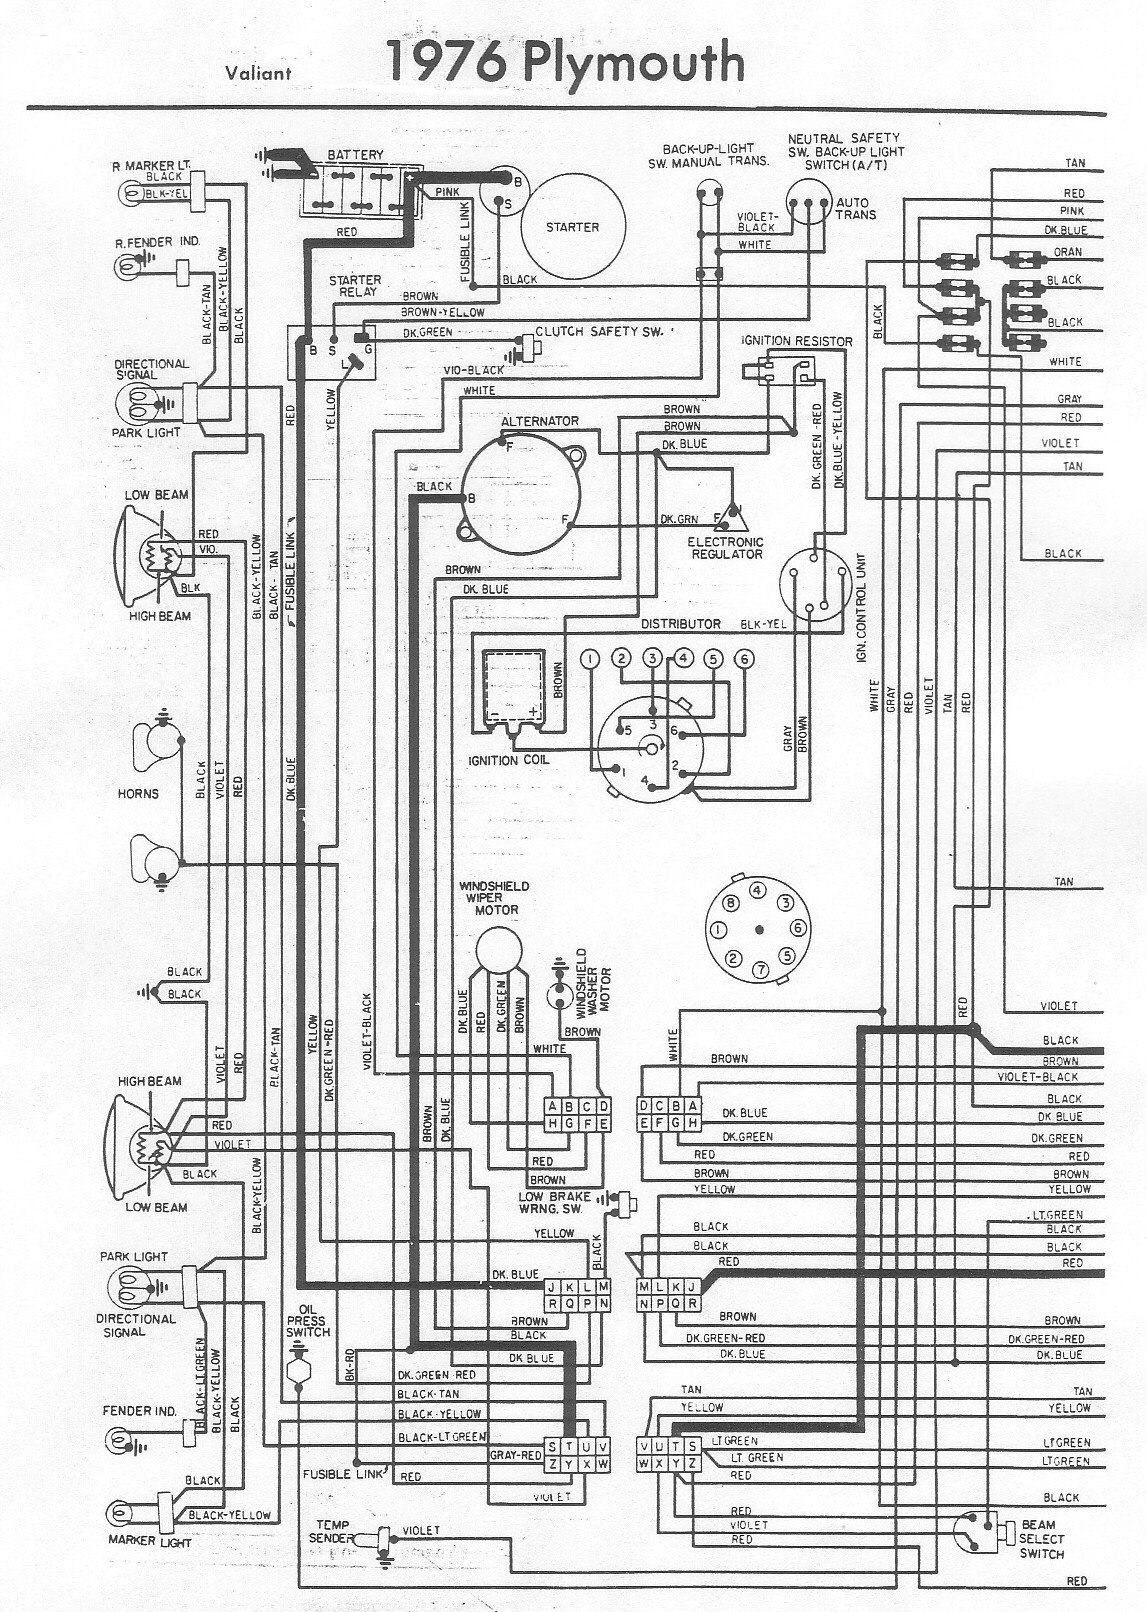 1976 Plymouth Valiant Dash Wiring - Mopar Forums on